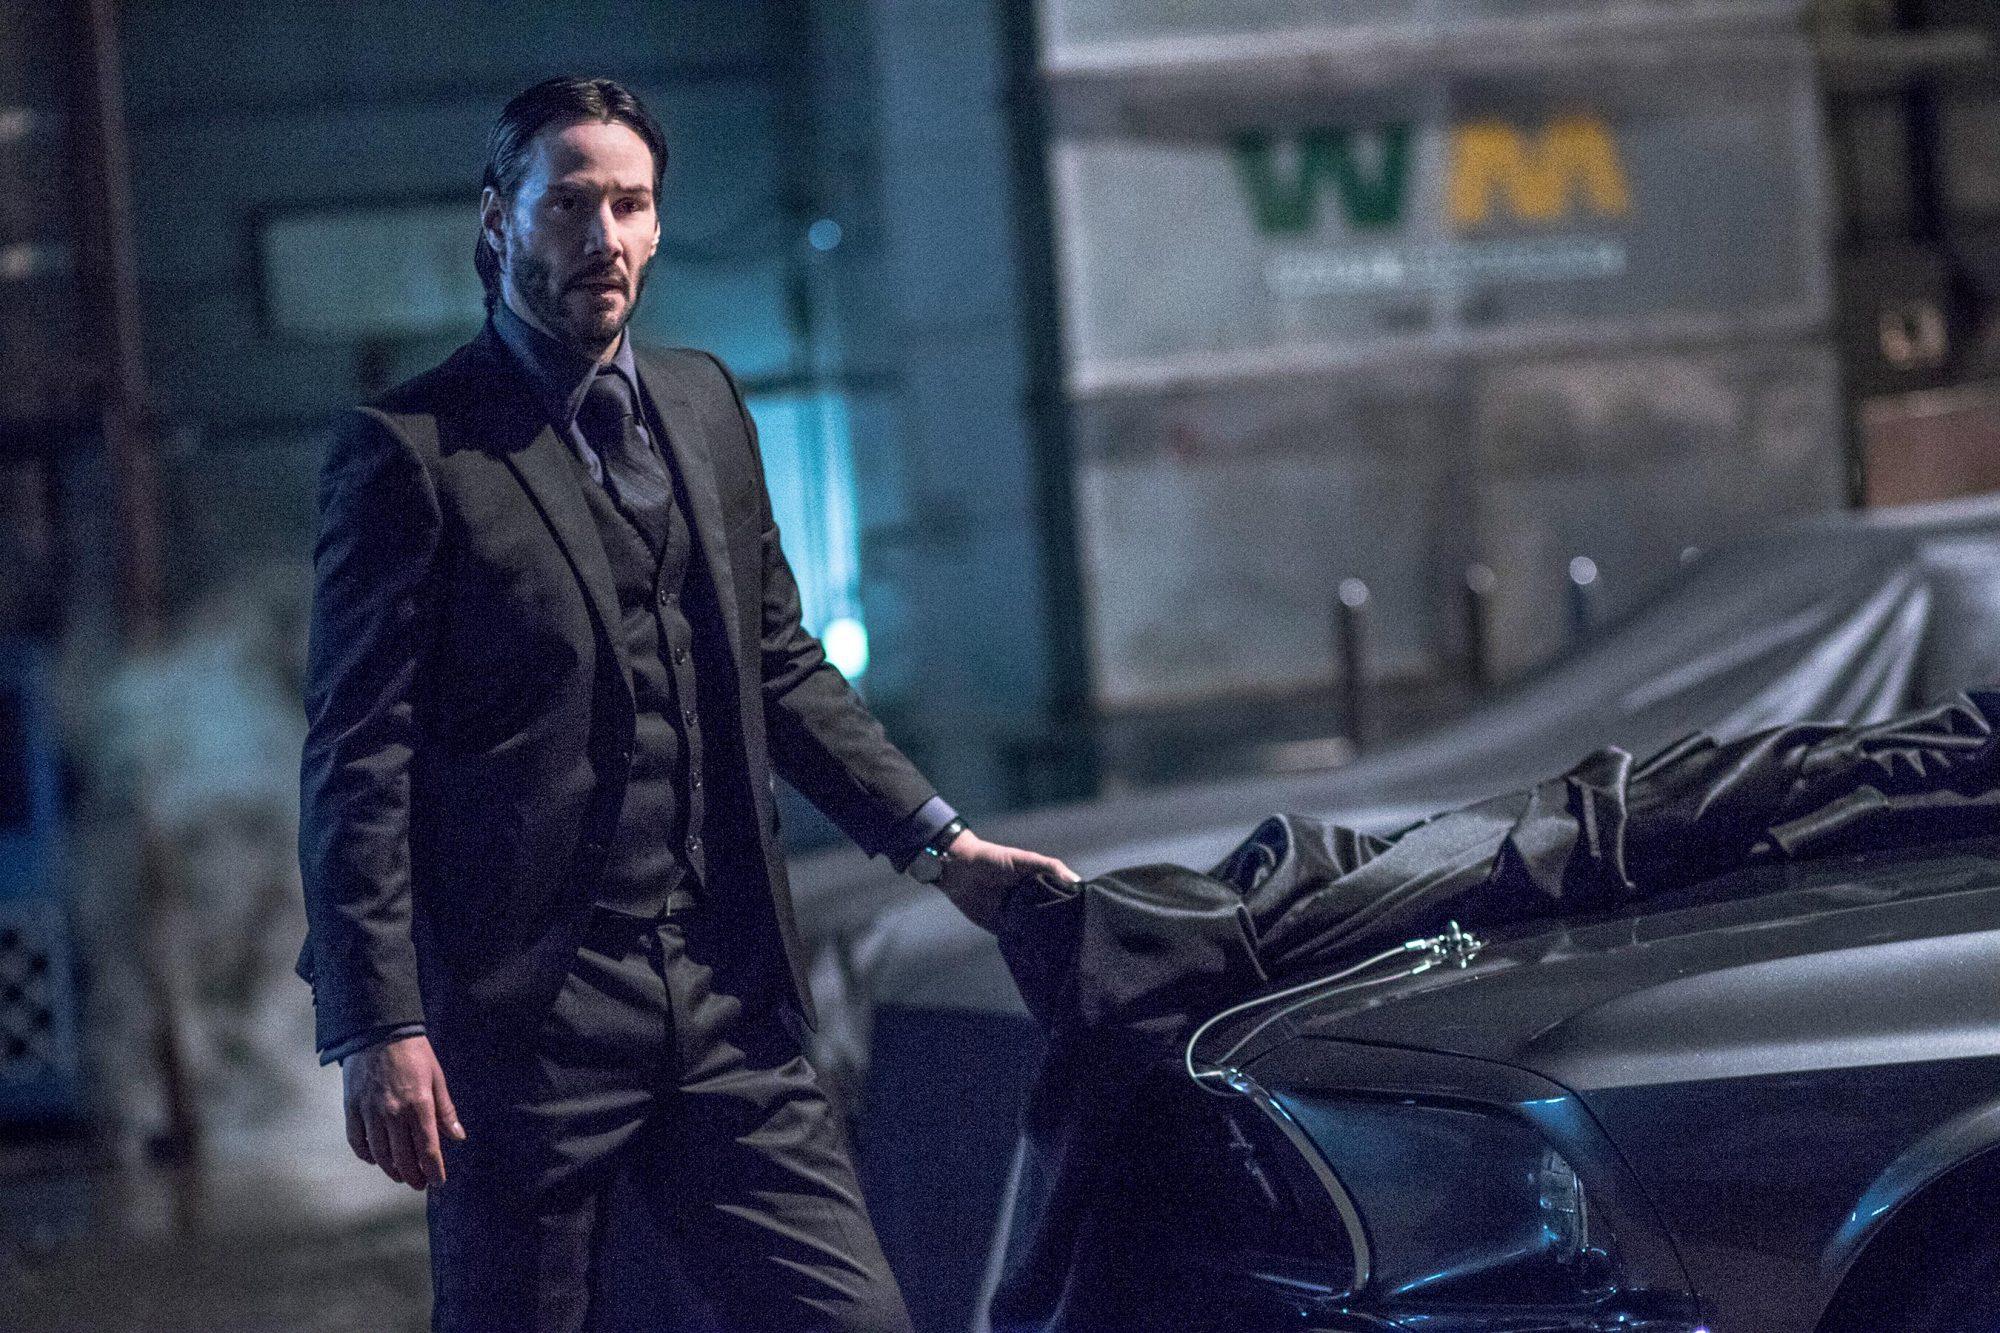 John Wick: Chapter 2 (2017)Keanu Reeves as John Wick